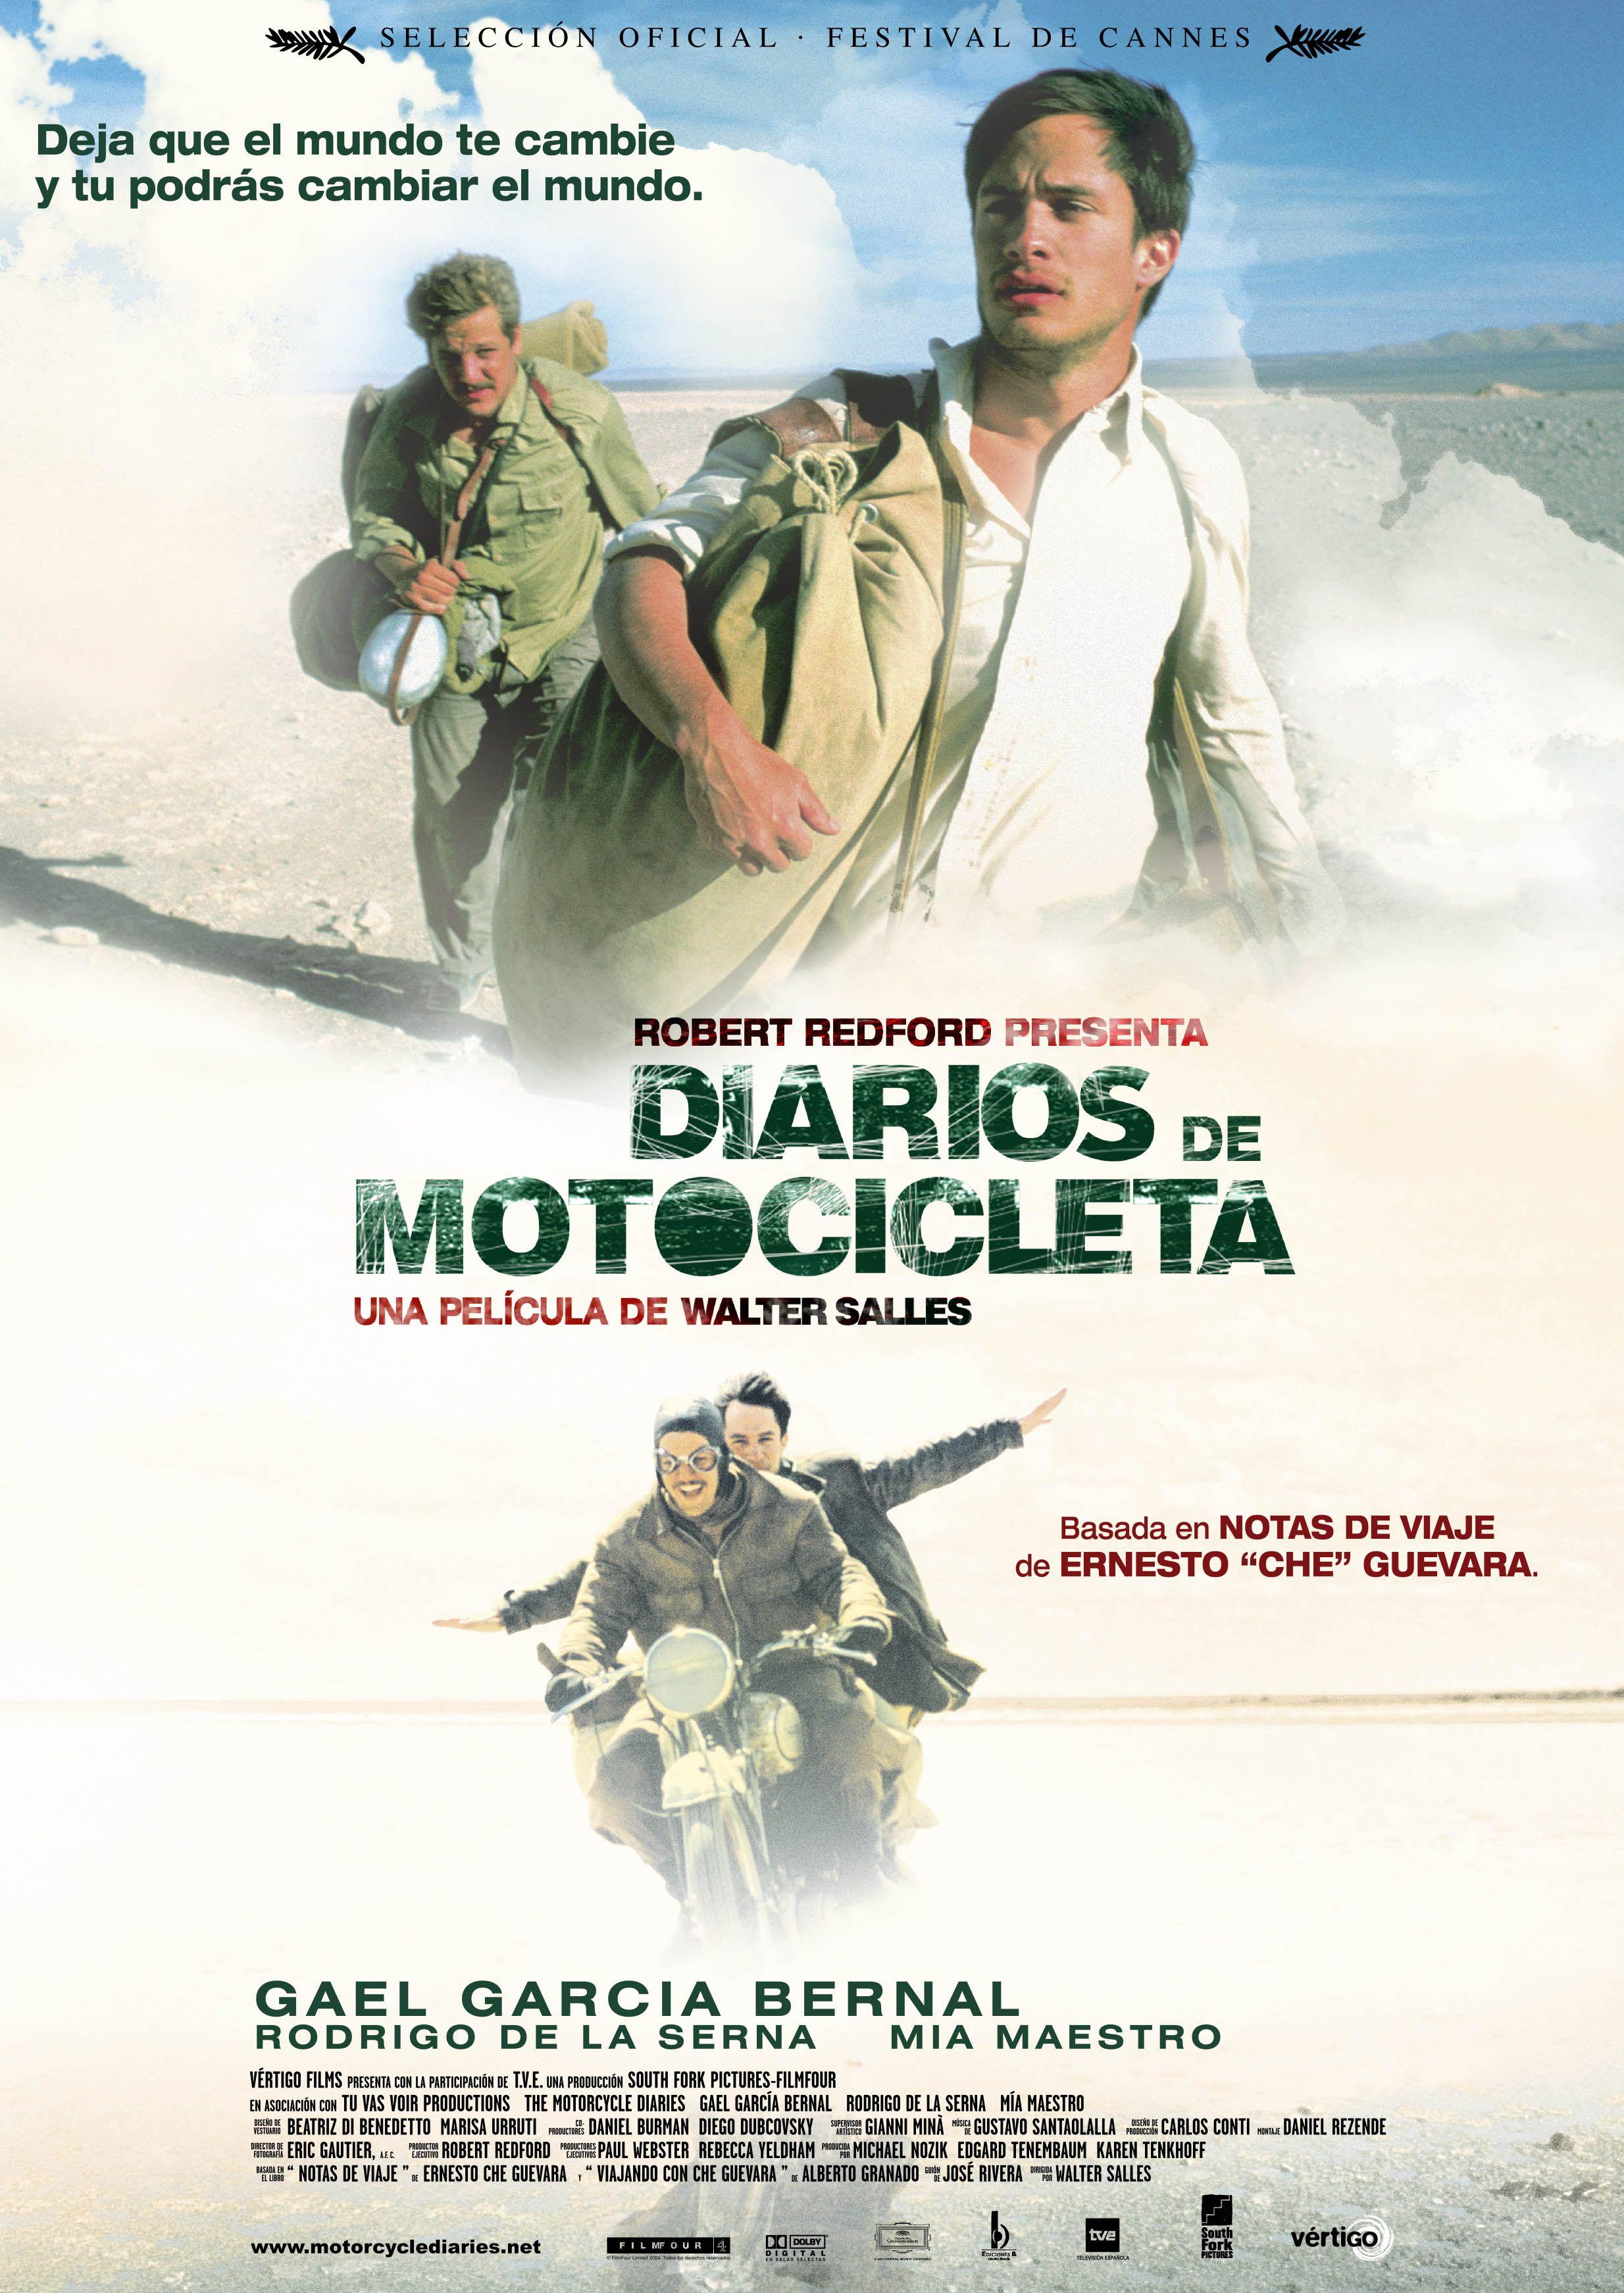 Diarios De Motocicleta Motorcycle Diaries Film Afişleri Sinema Film